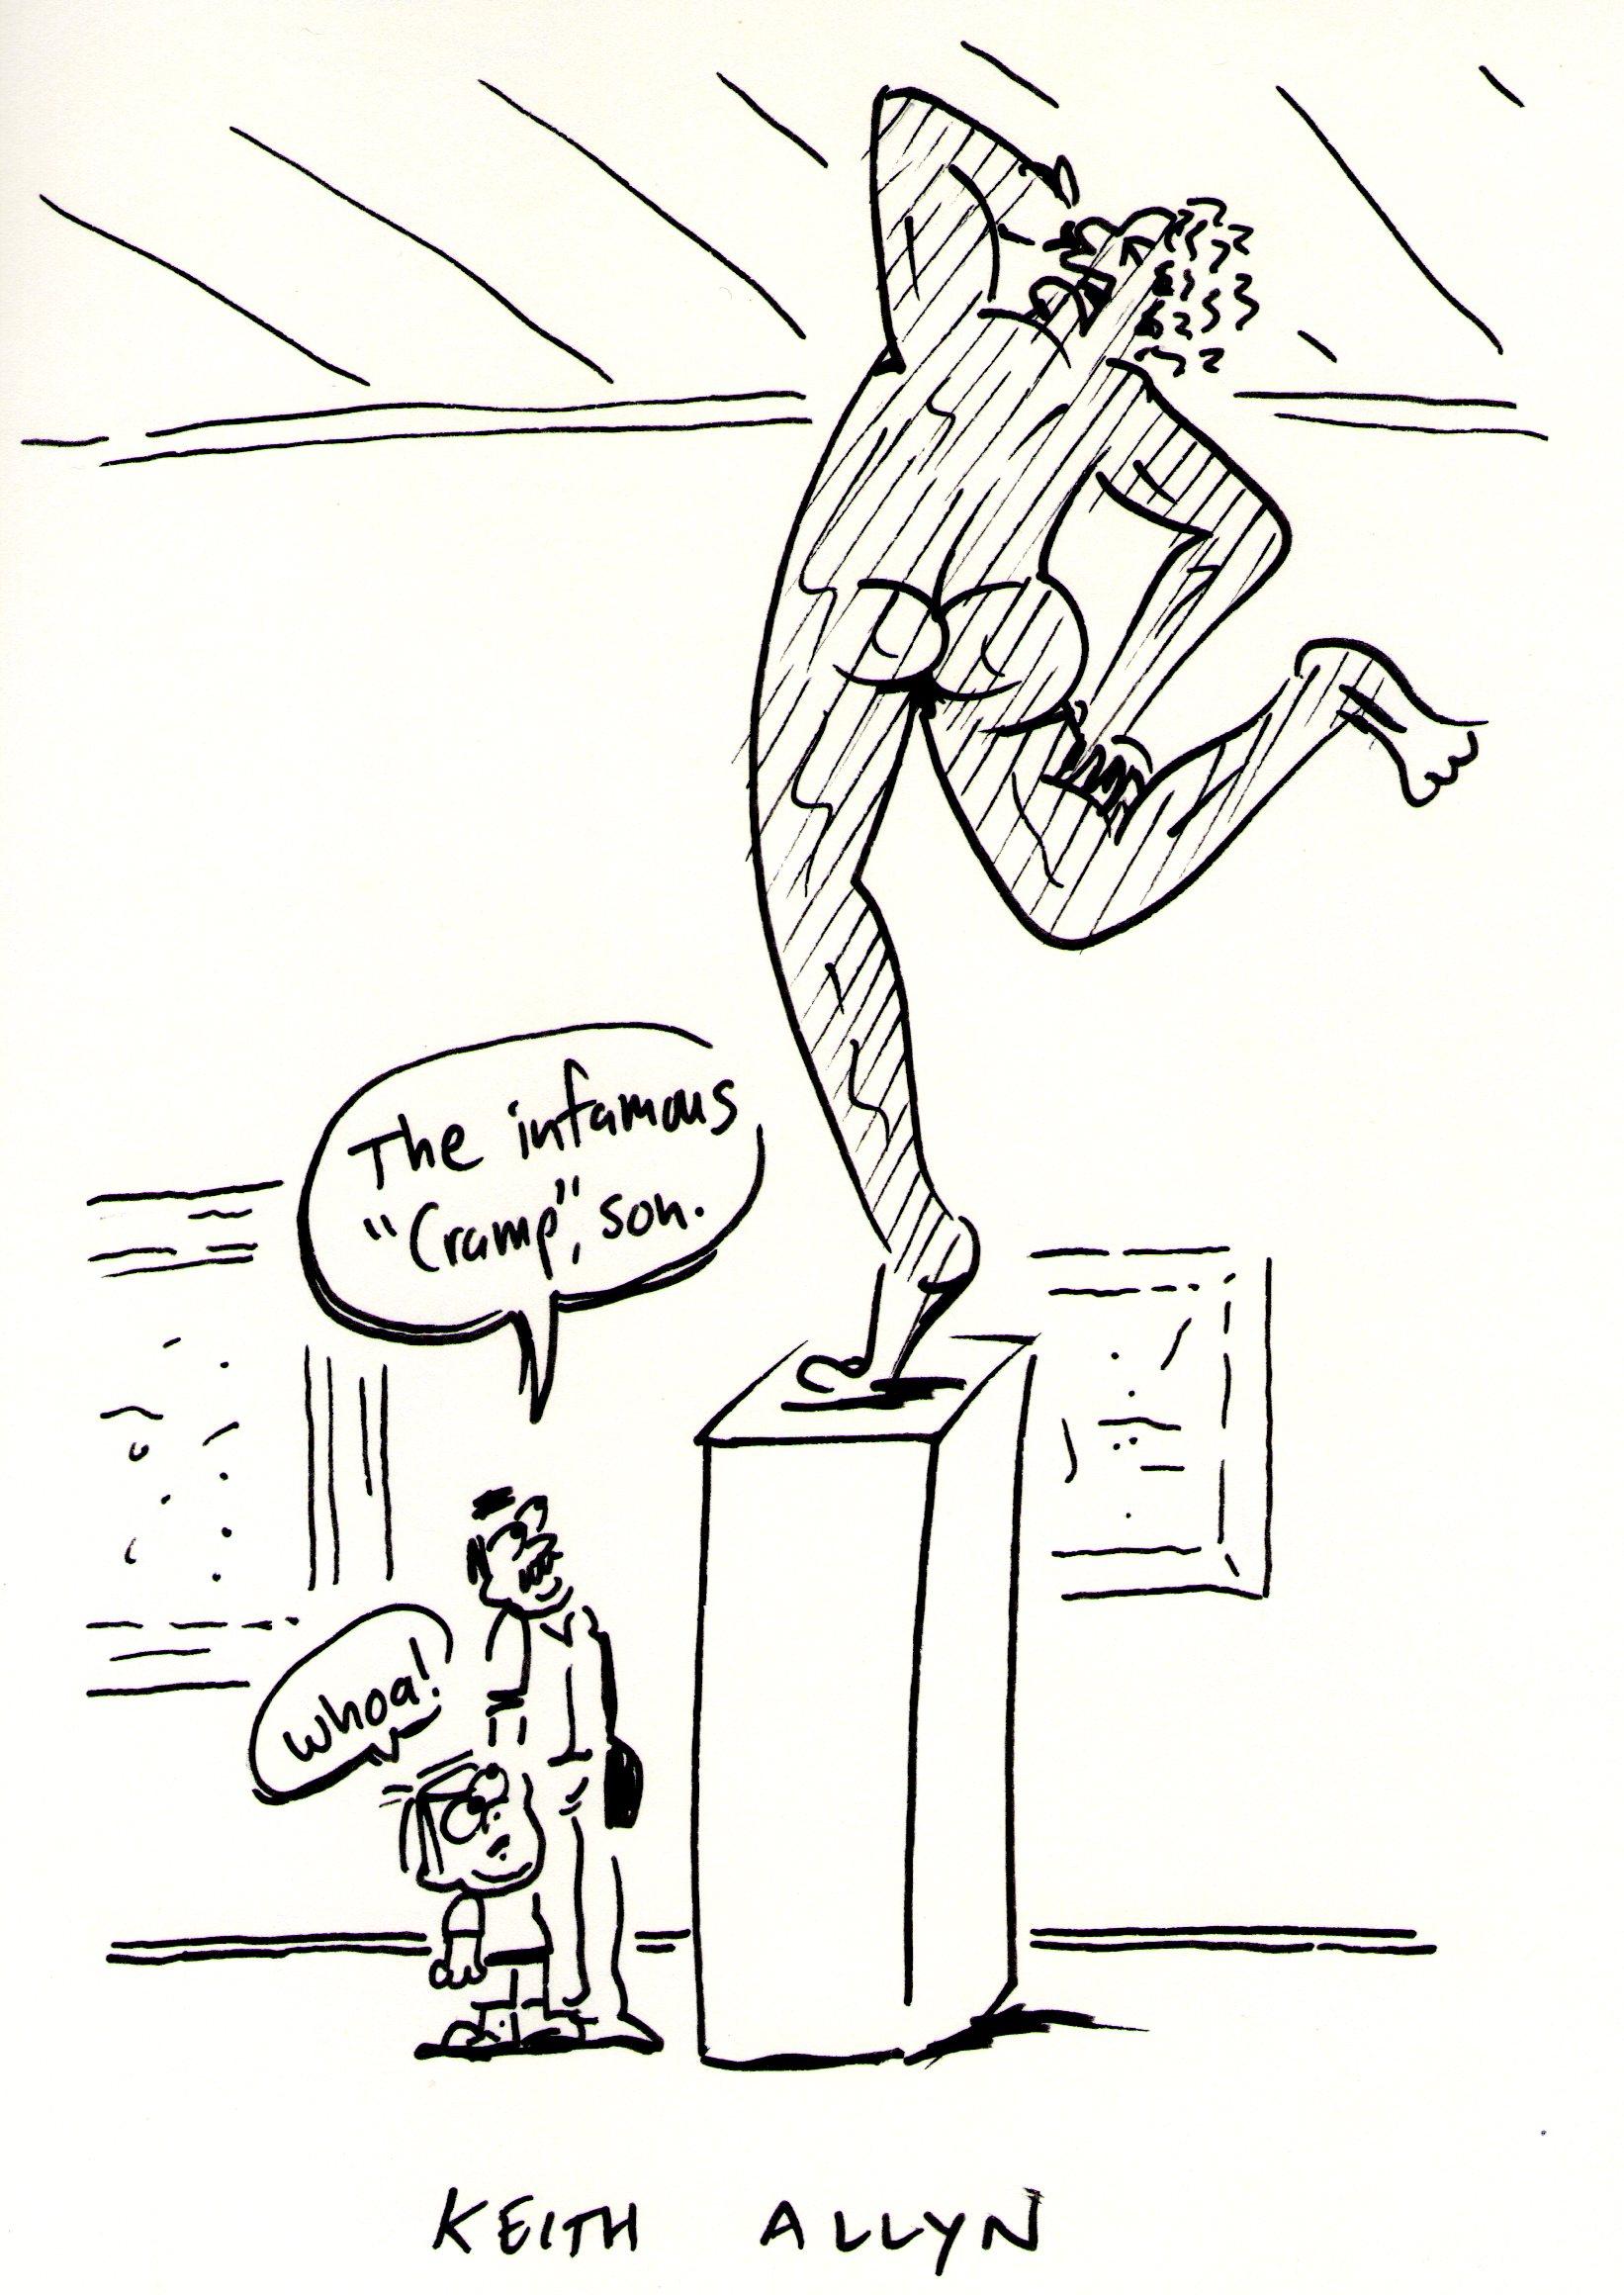 sculpture, cramp, cartoon, keithallyn